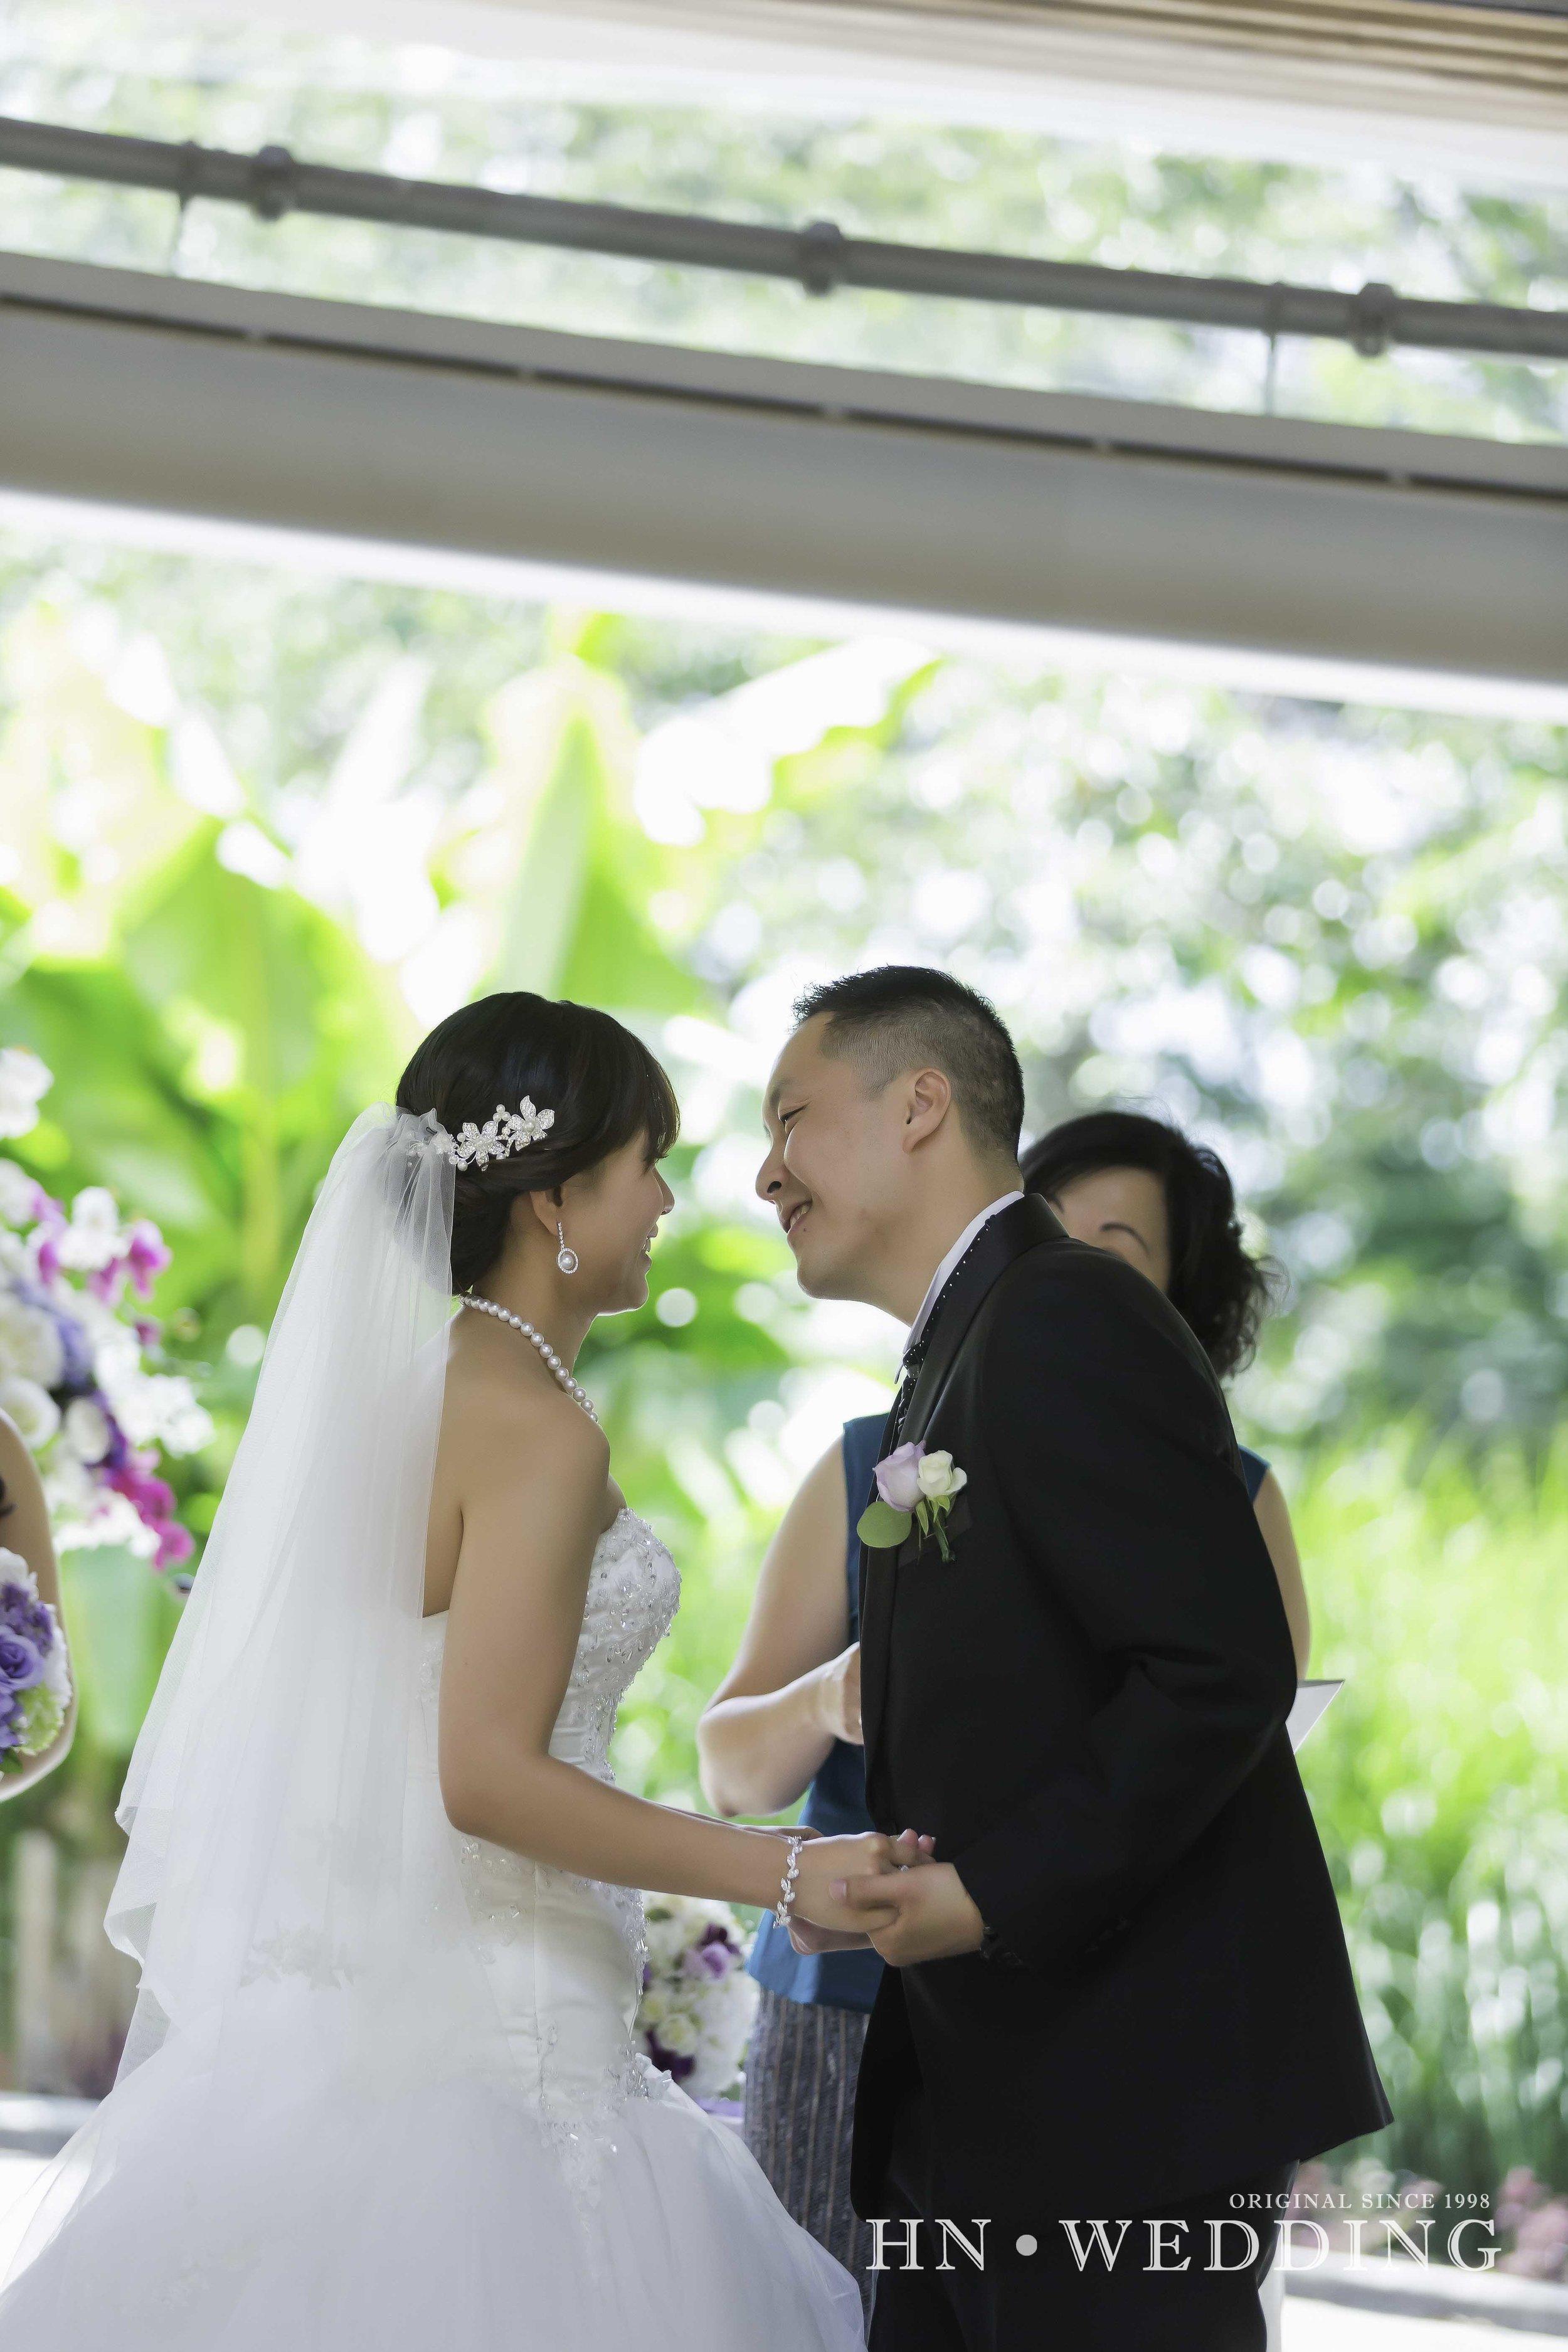 HNwedding-20160822-wedding-6199.jpg